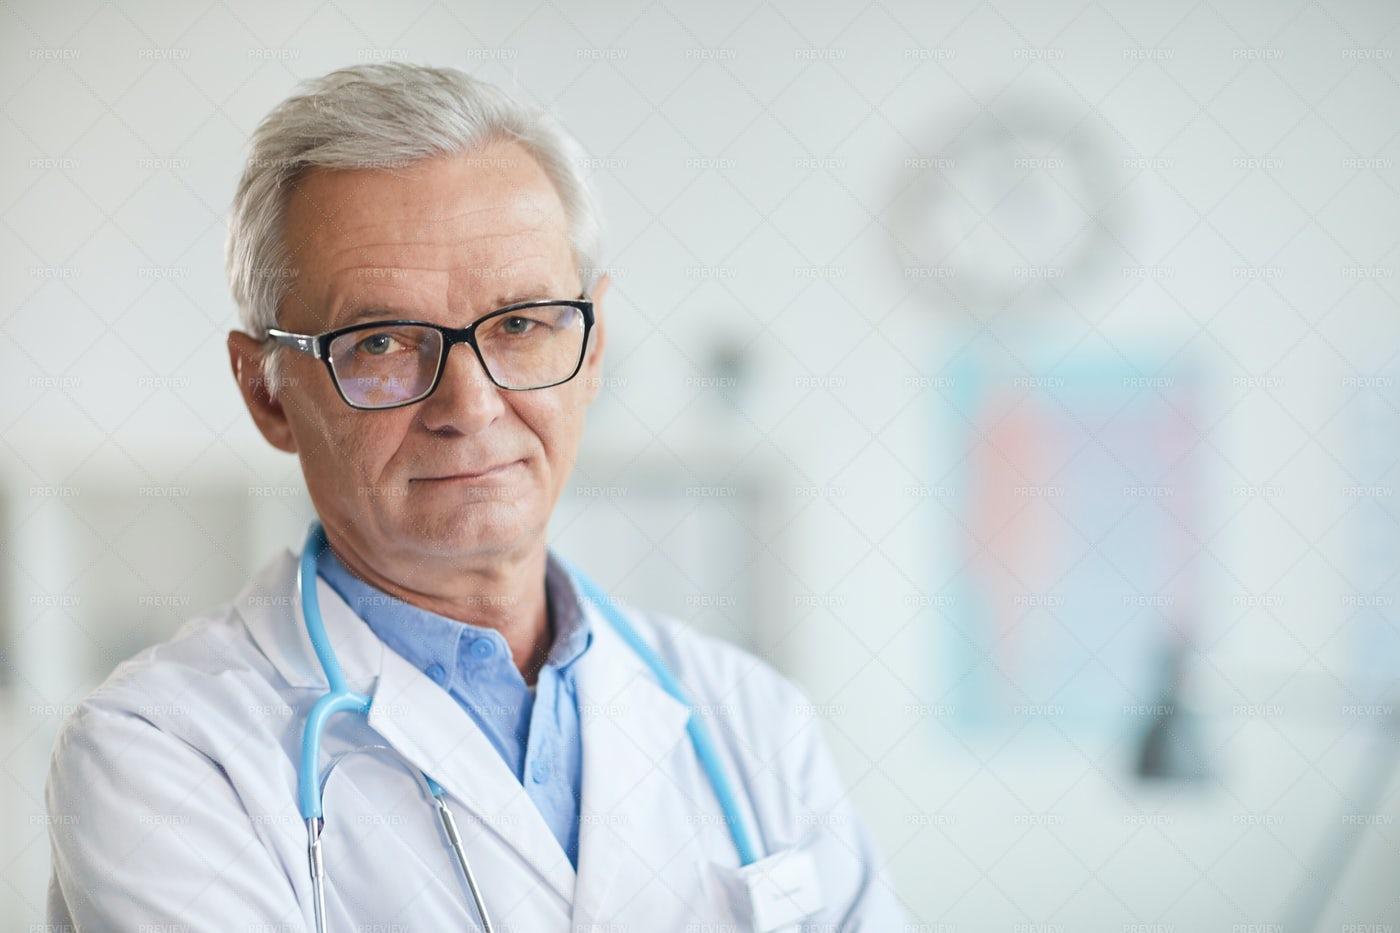 Experienced Senior Doctor Portrait: Stock Photos